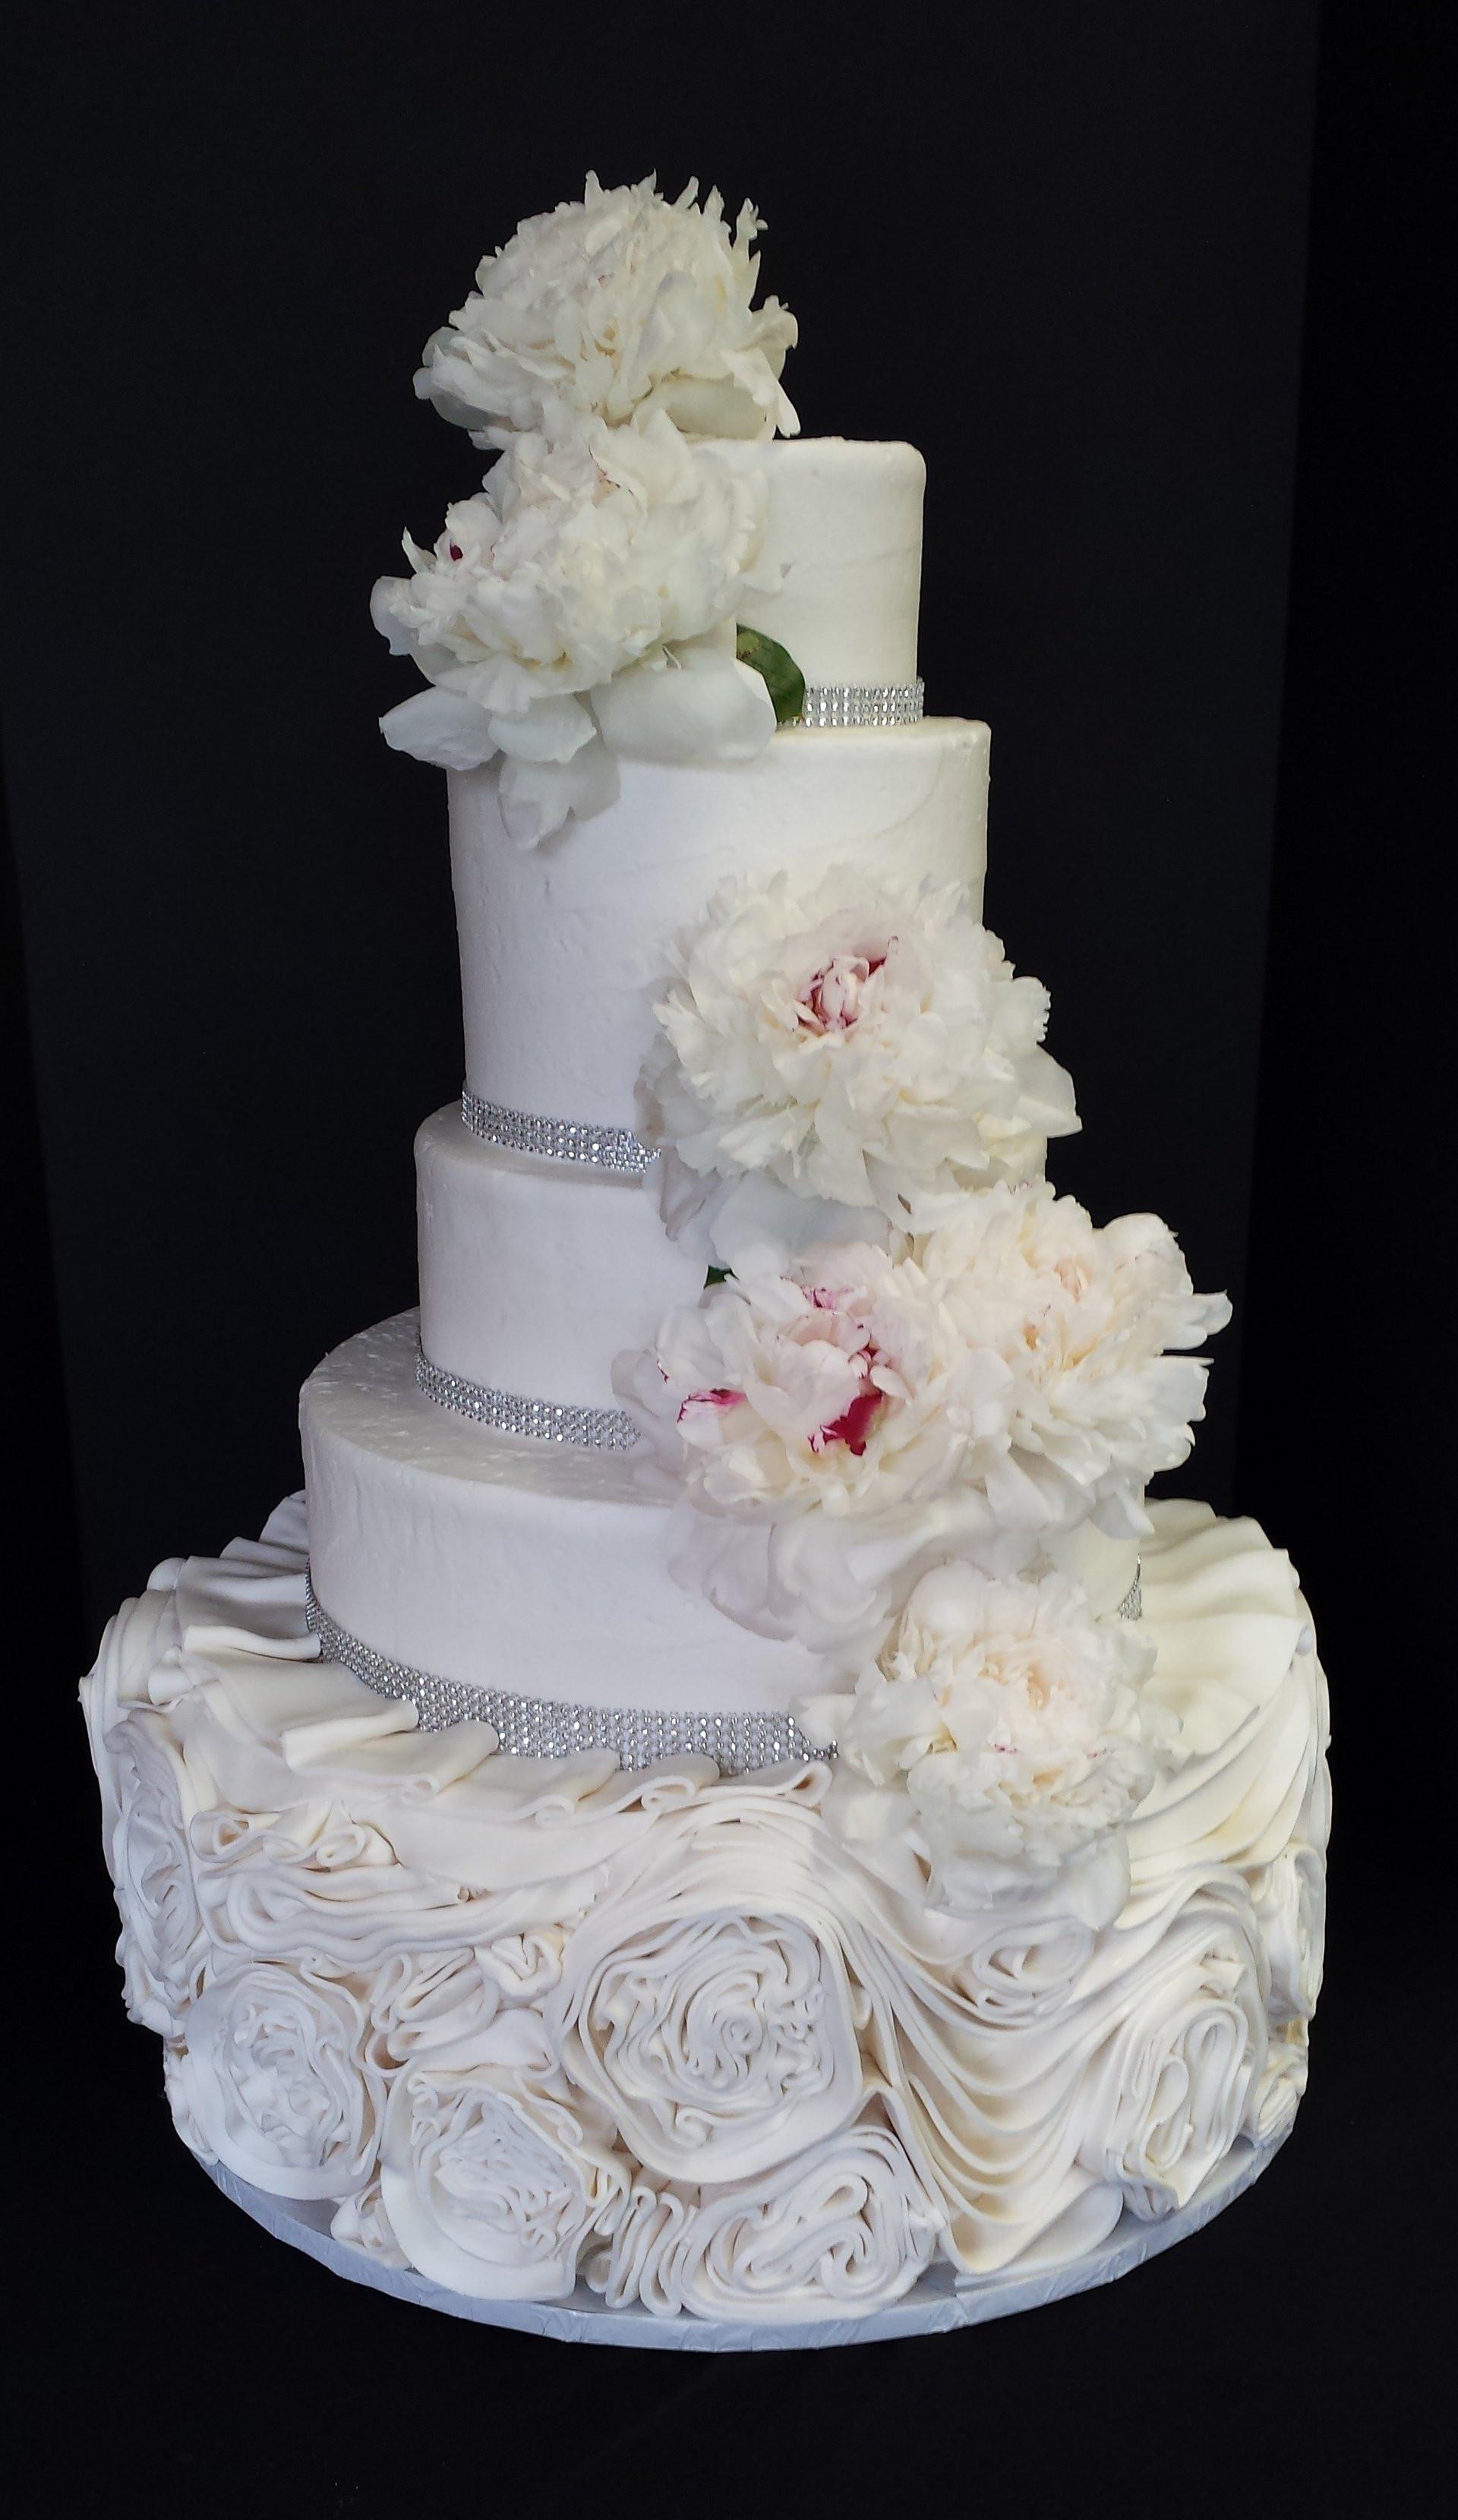 Wedding Cakes Dallas Tx  Dallas Affaires Cake Co Dallas TX